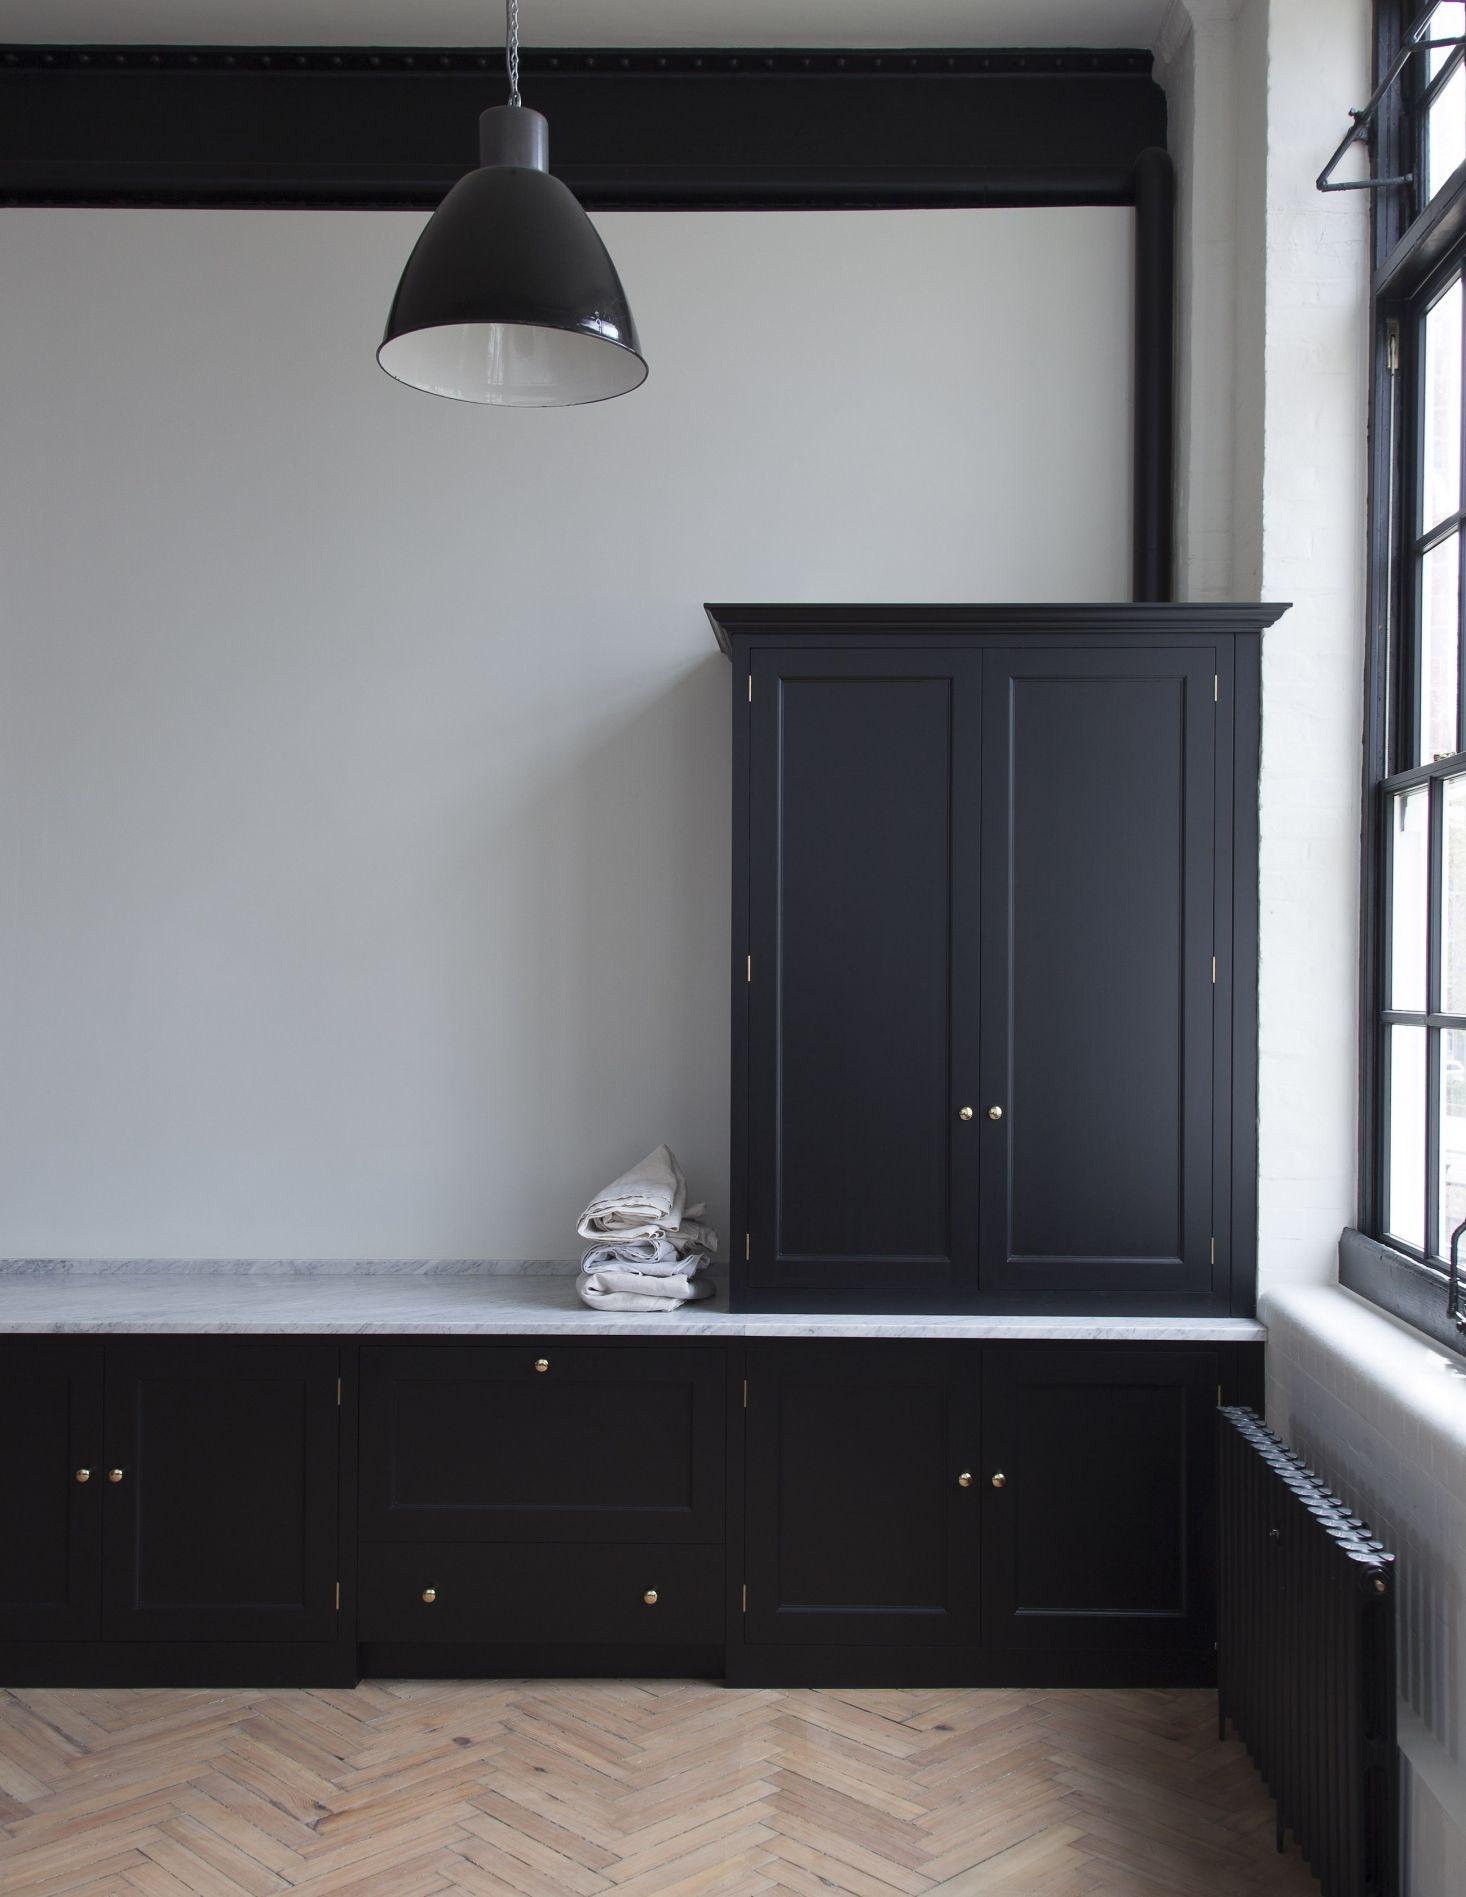 Plain English: Bespoke British Kitchen Design Comes to the US - Remodelista